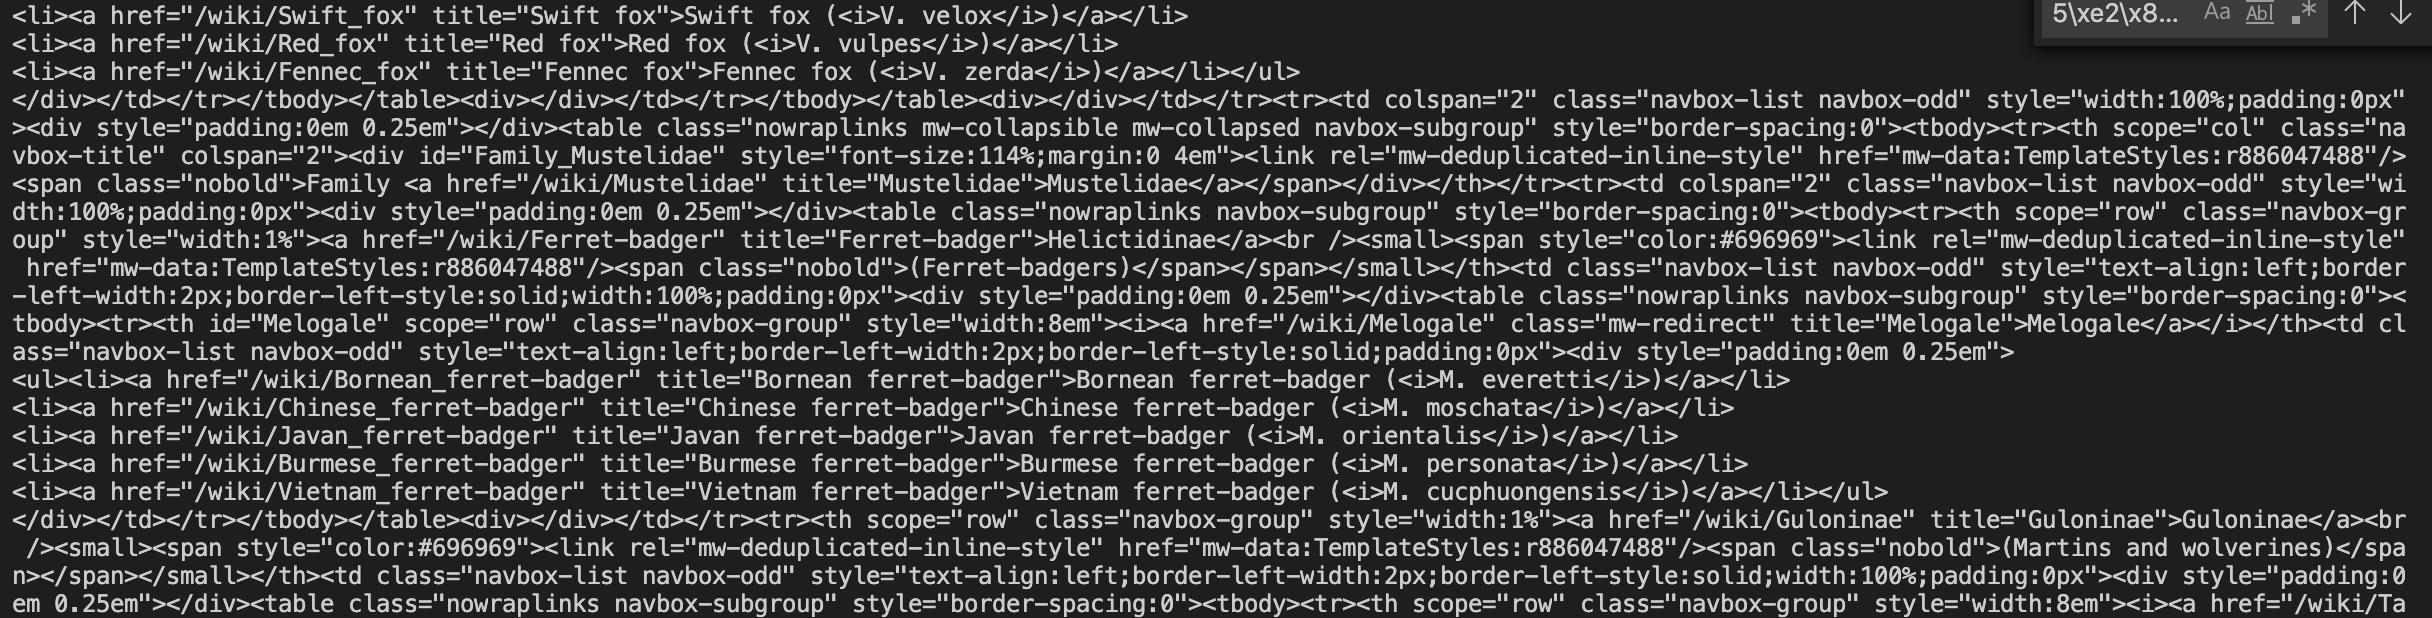 Bad HTML